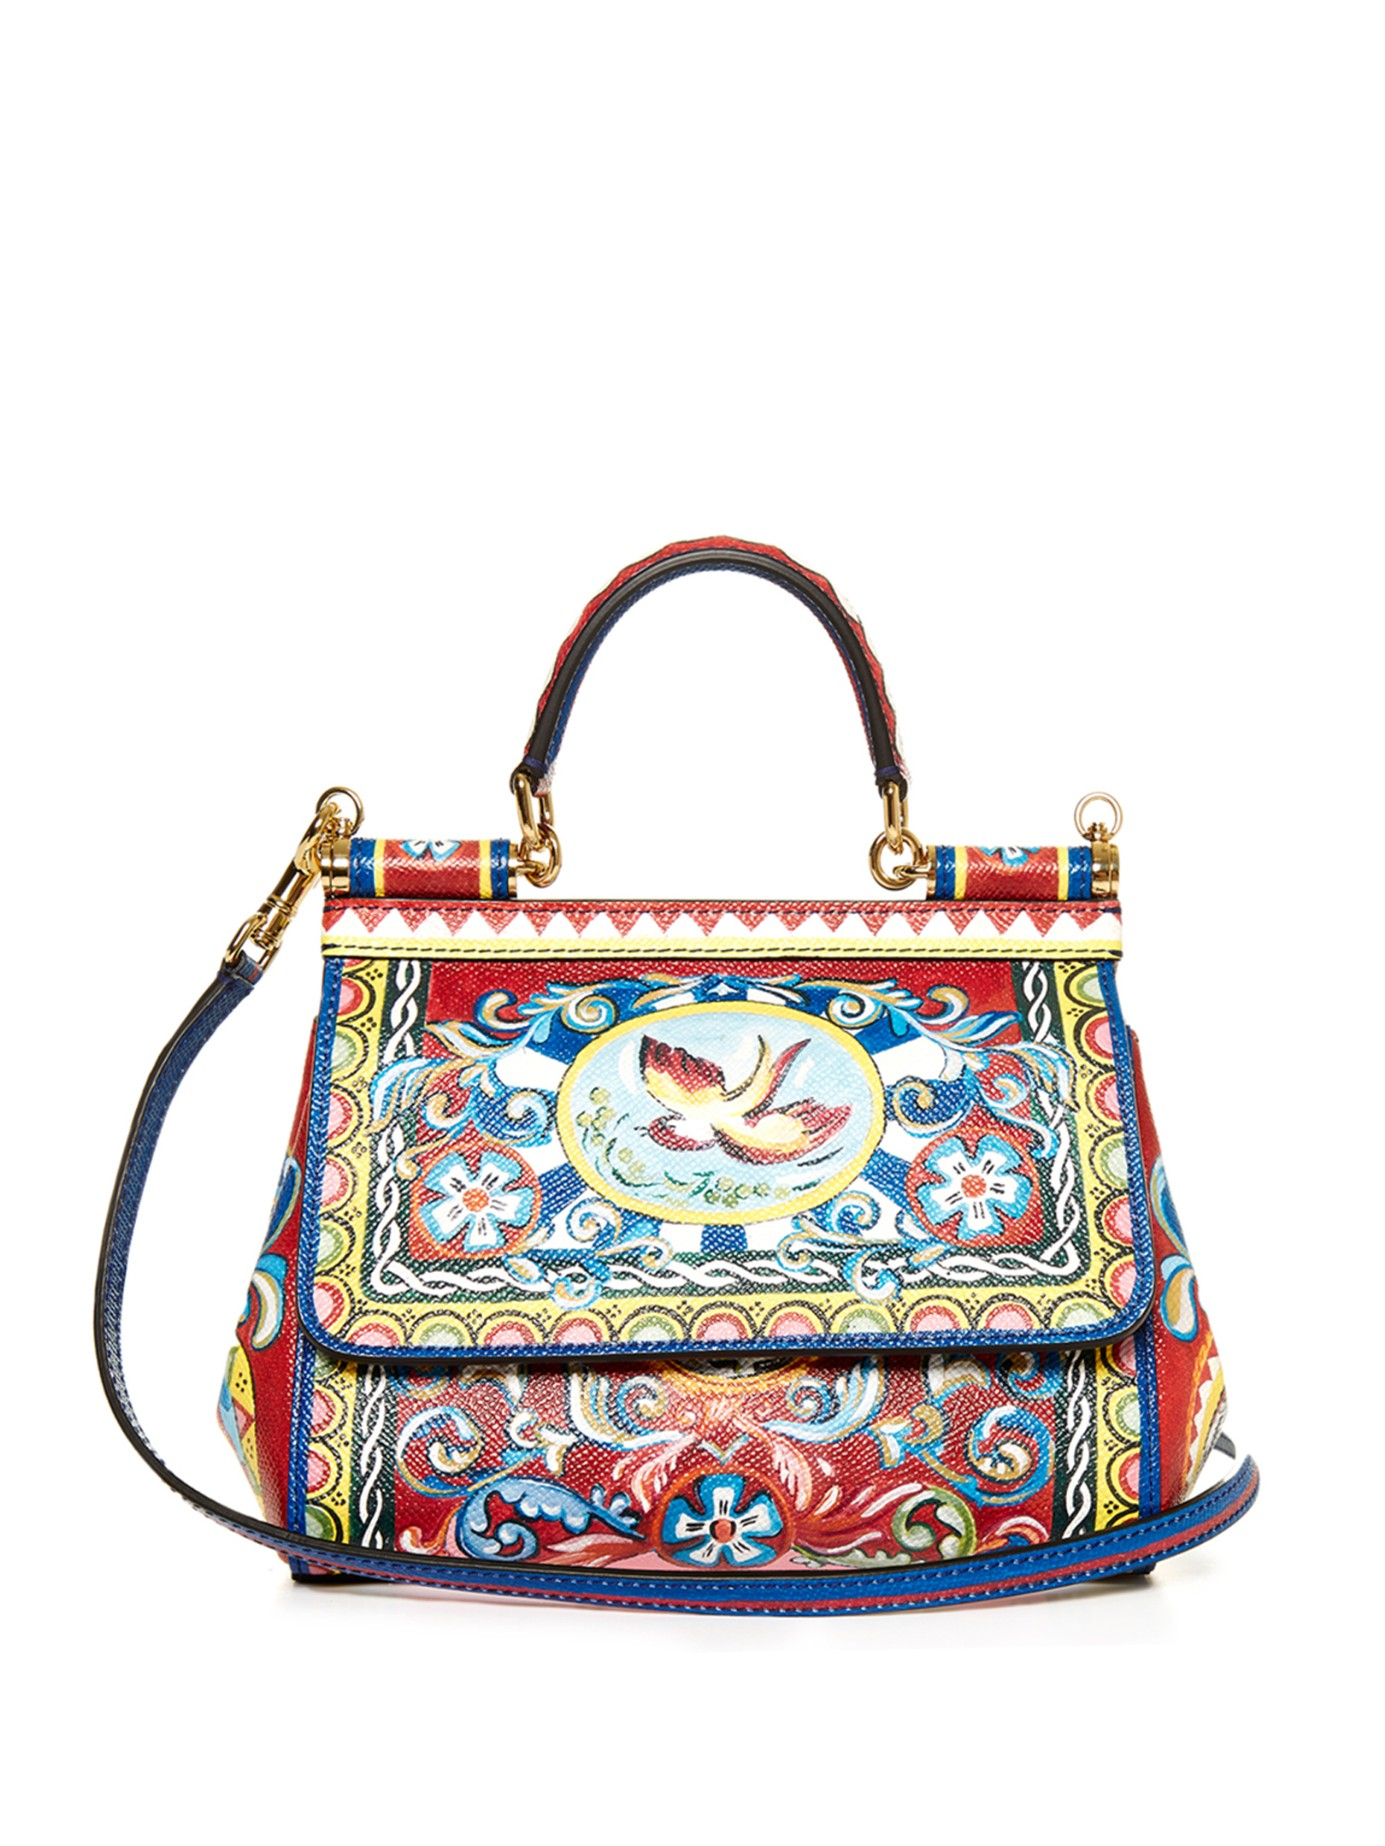 Lyst - Dolce   Gabbana Sicily Small Carretto-Print Shoulder Bag in Red 728179f5d38e6